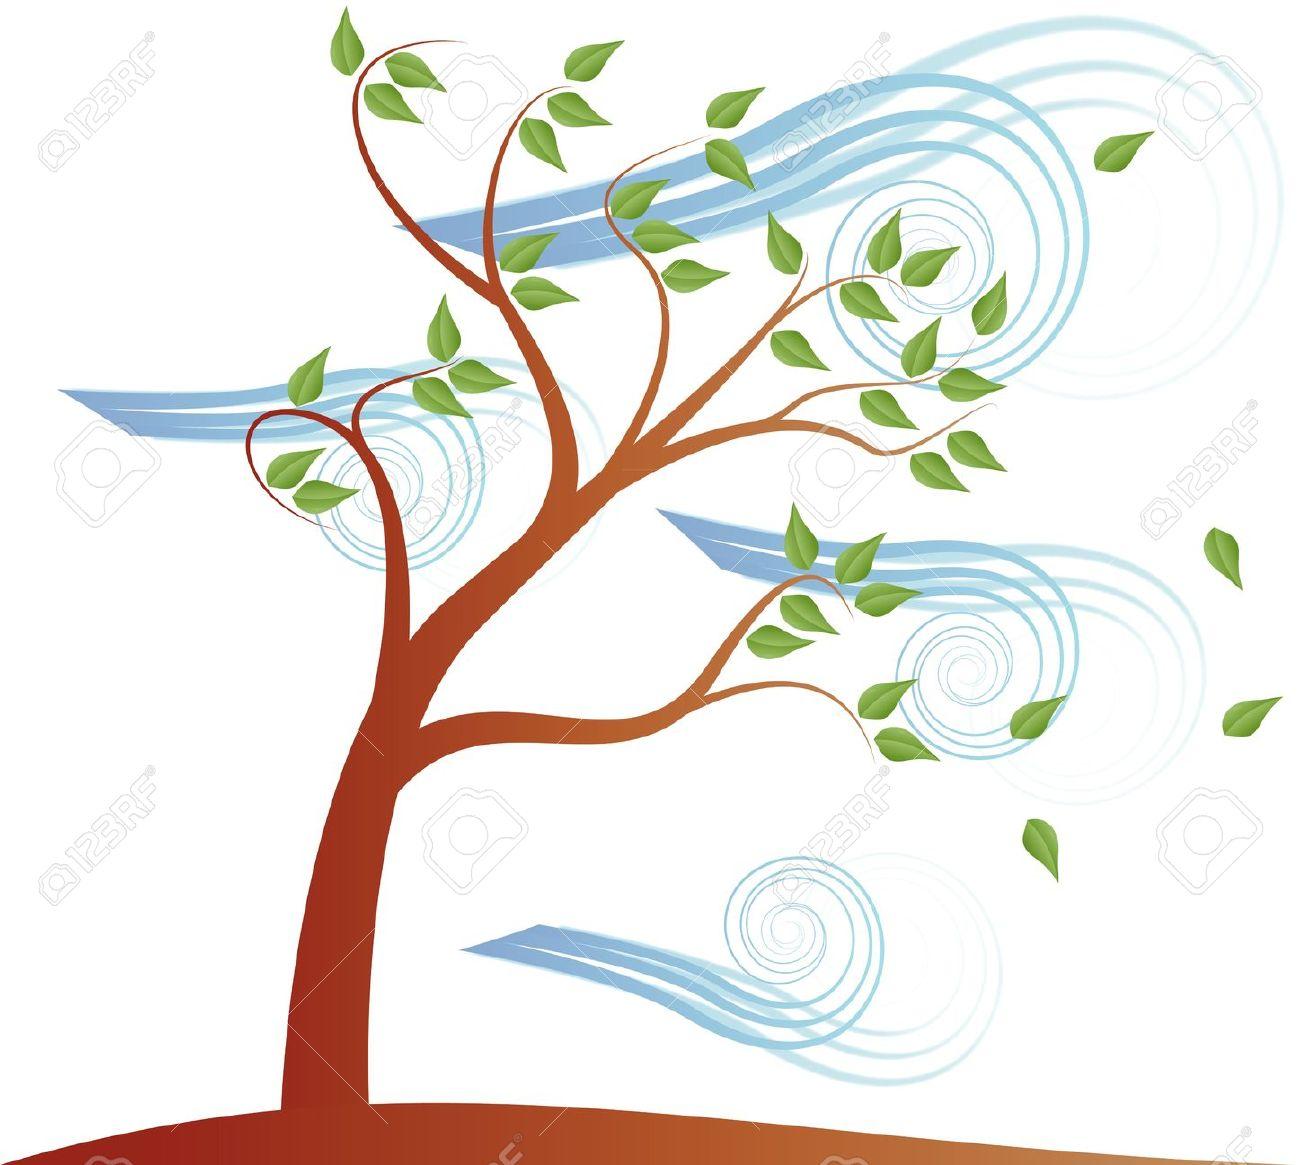 Swirl windy tree clipart